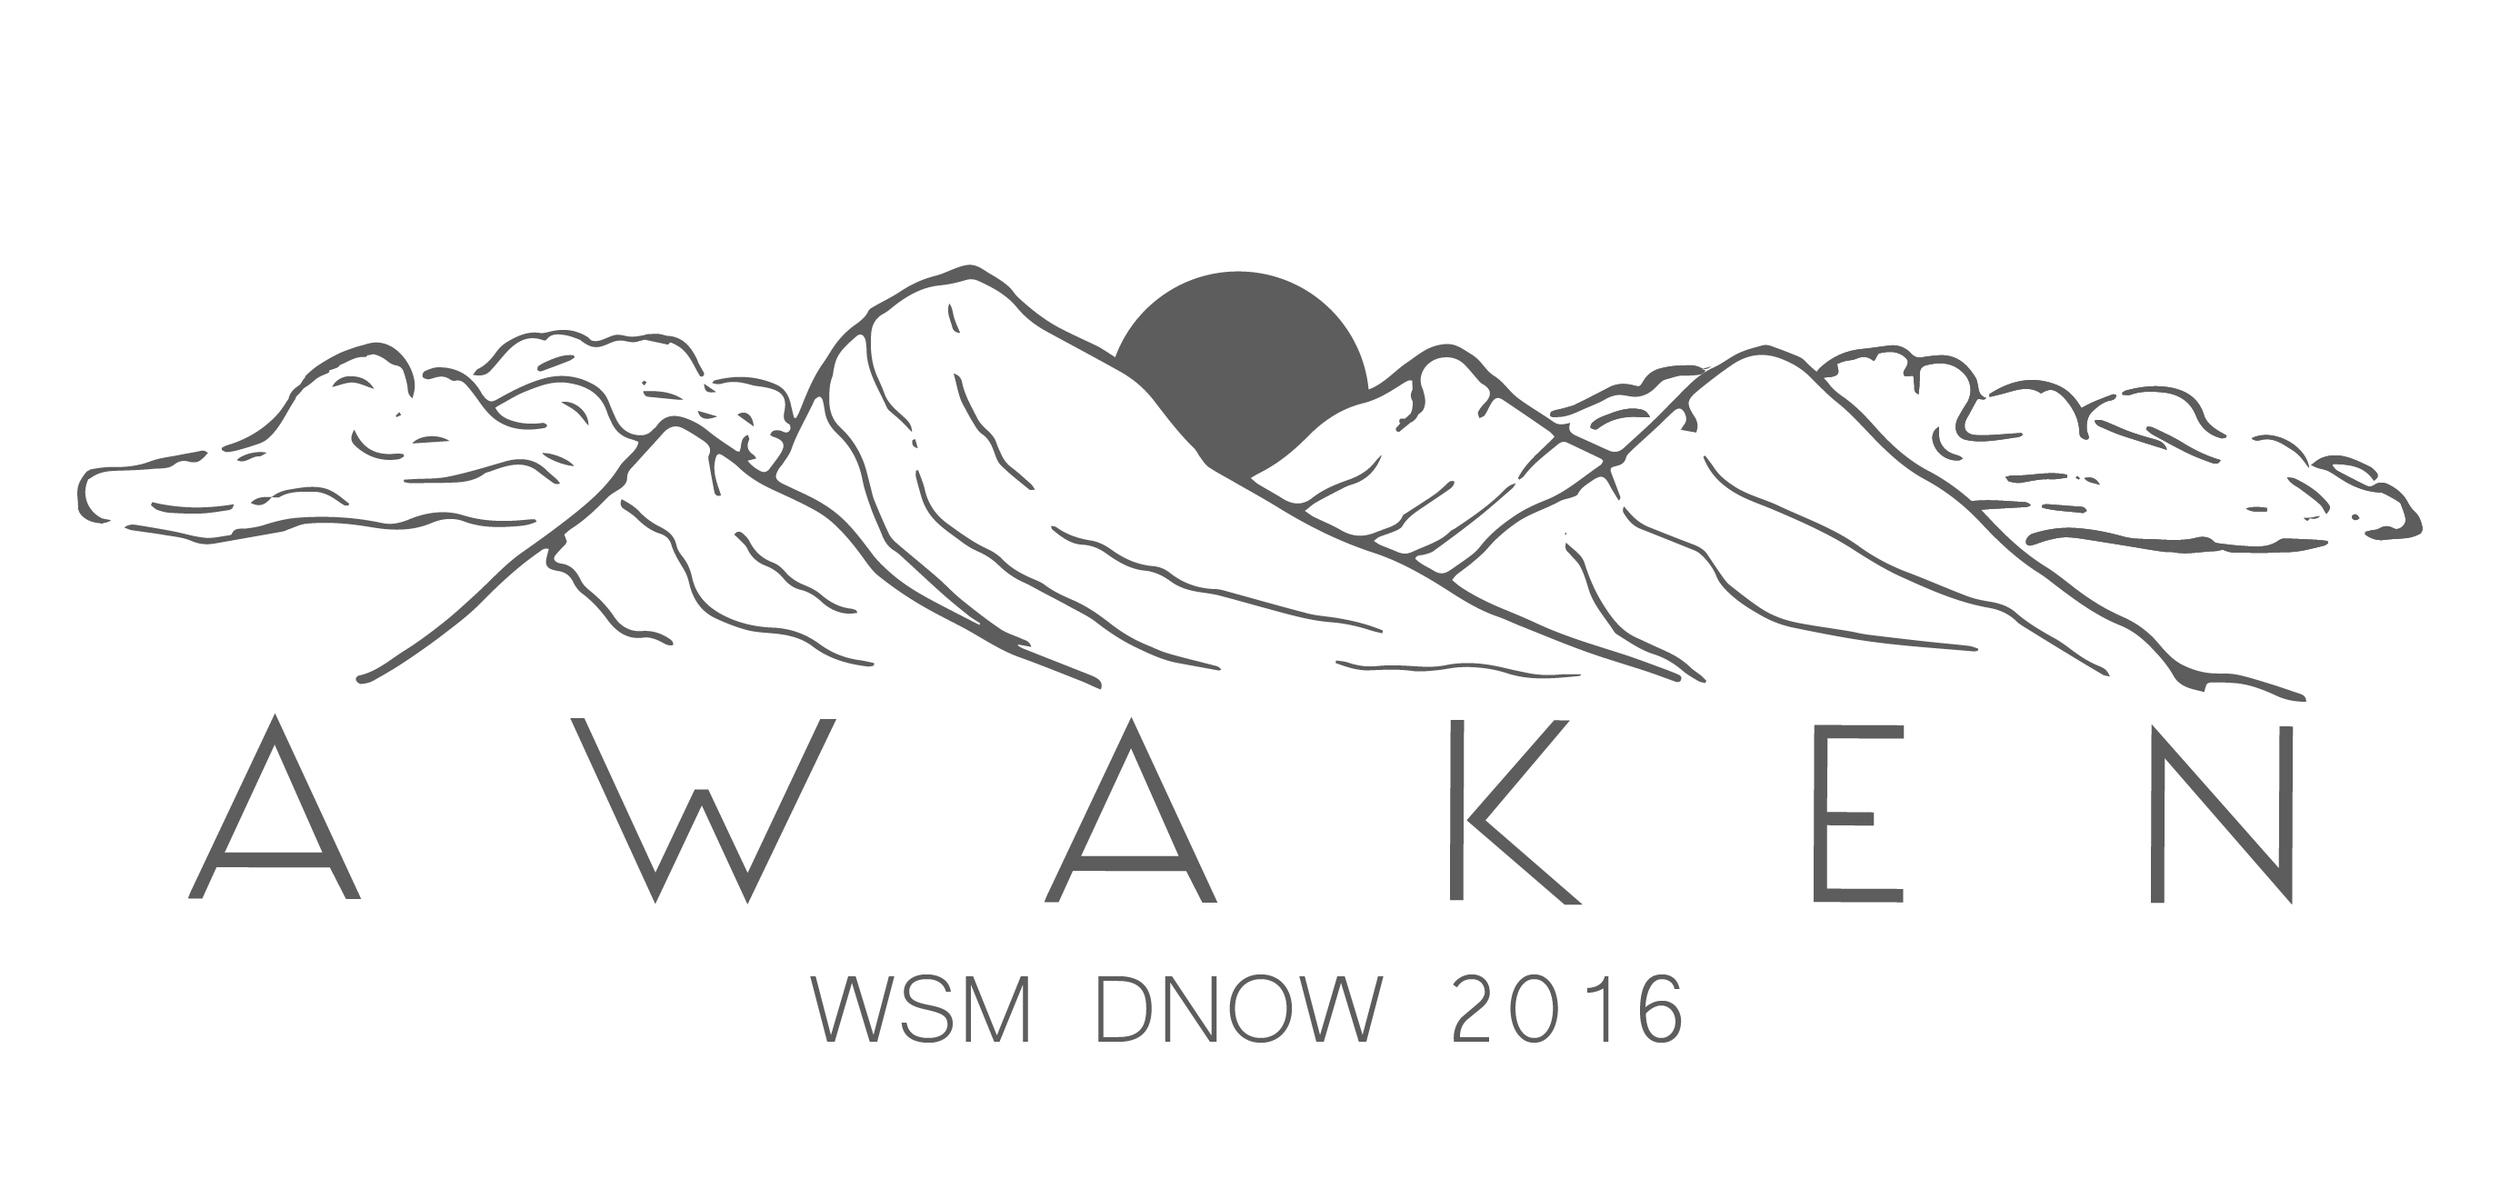 Wildwood Student Ministries DNOW '16